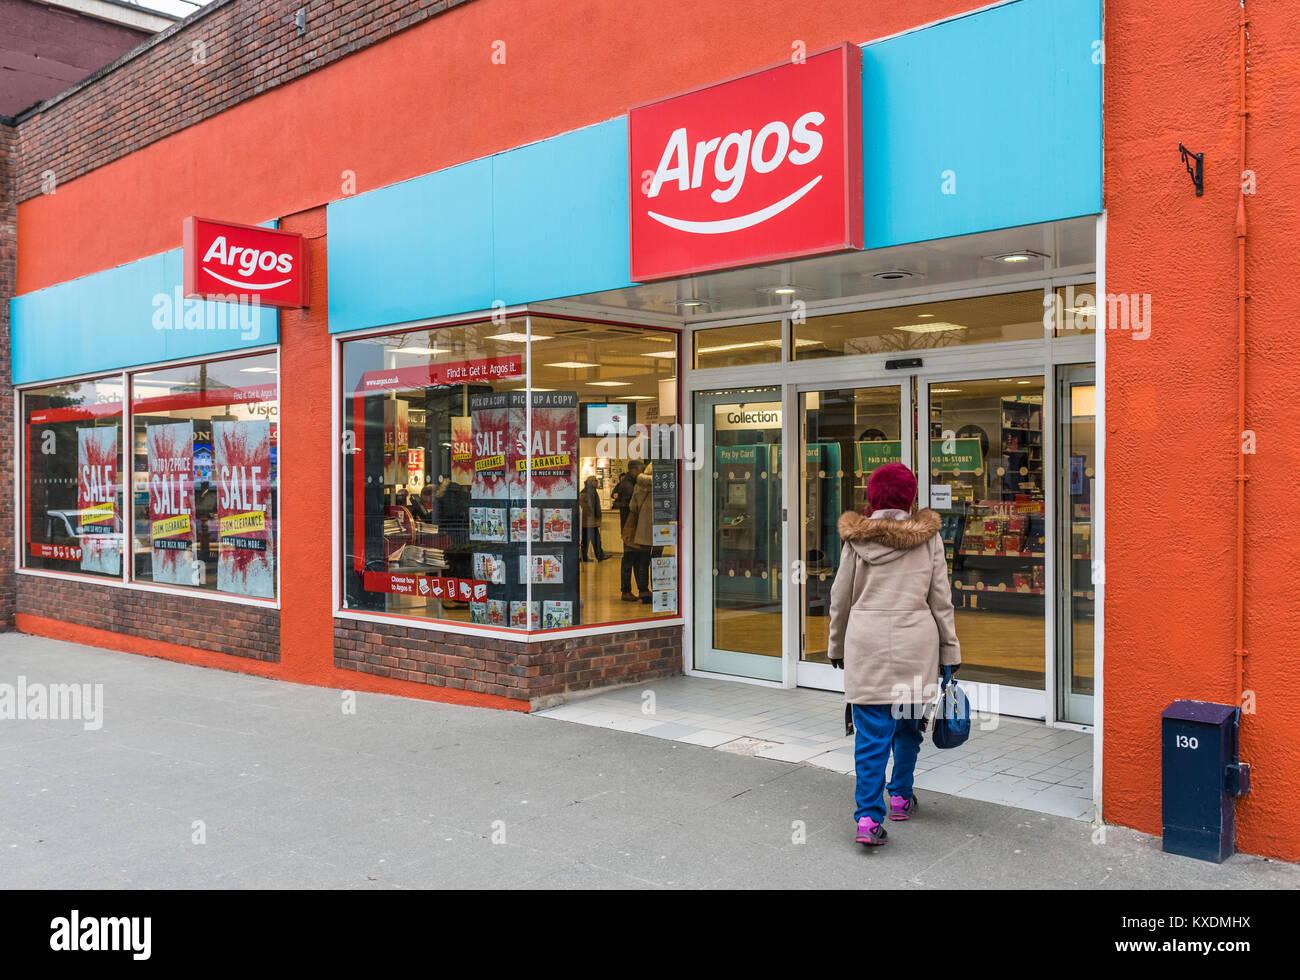 Argos shop front entrance in Horsham, West Sussex, England, UK. Stock Photo